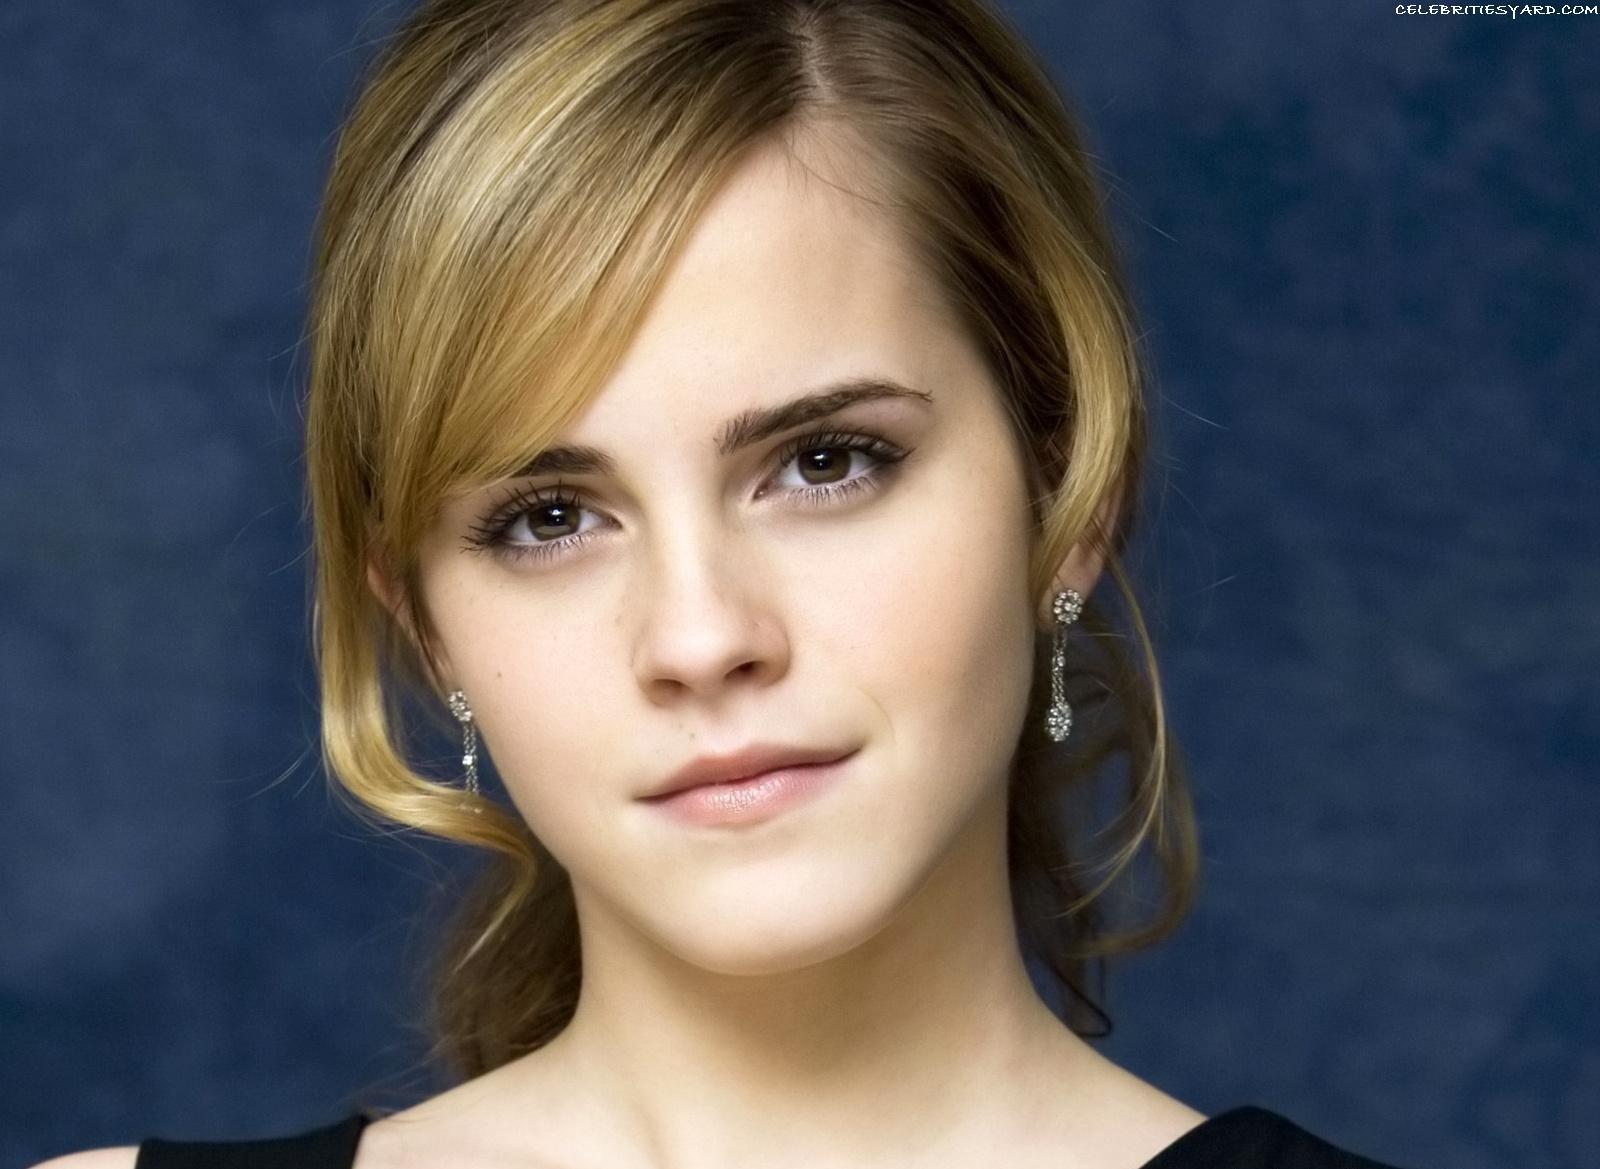 emma watson in harry potter 6 new wallpapers - Emma Watson in Harry Potter 6 New photo download